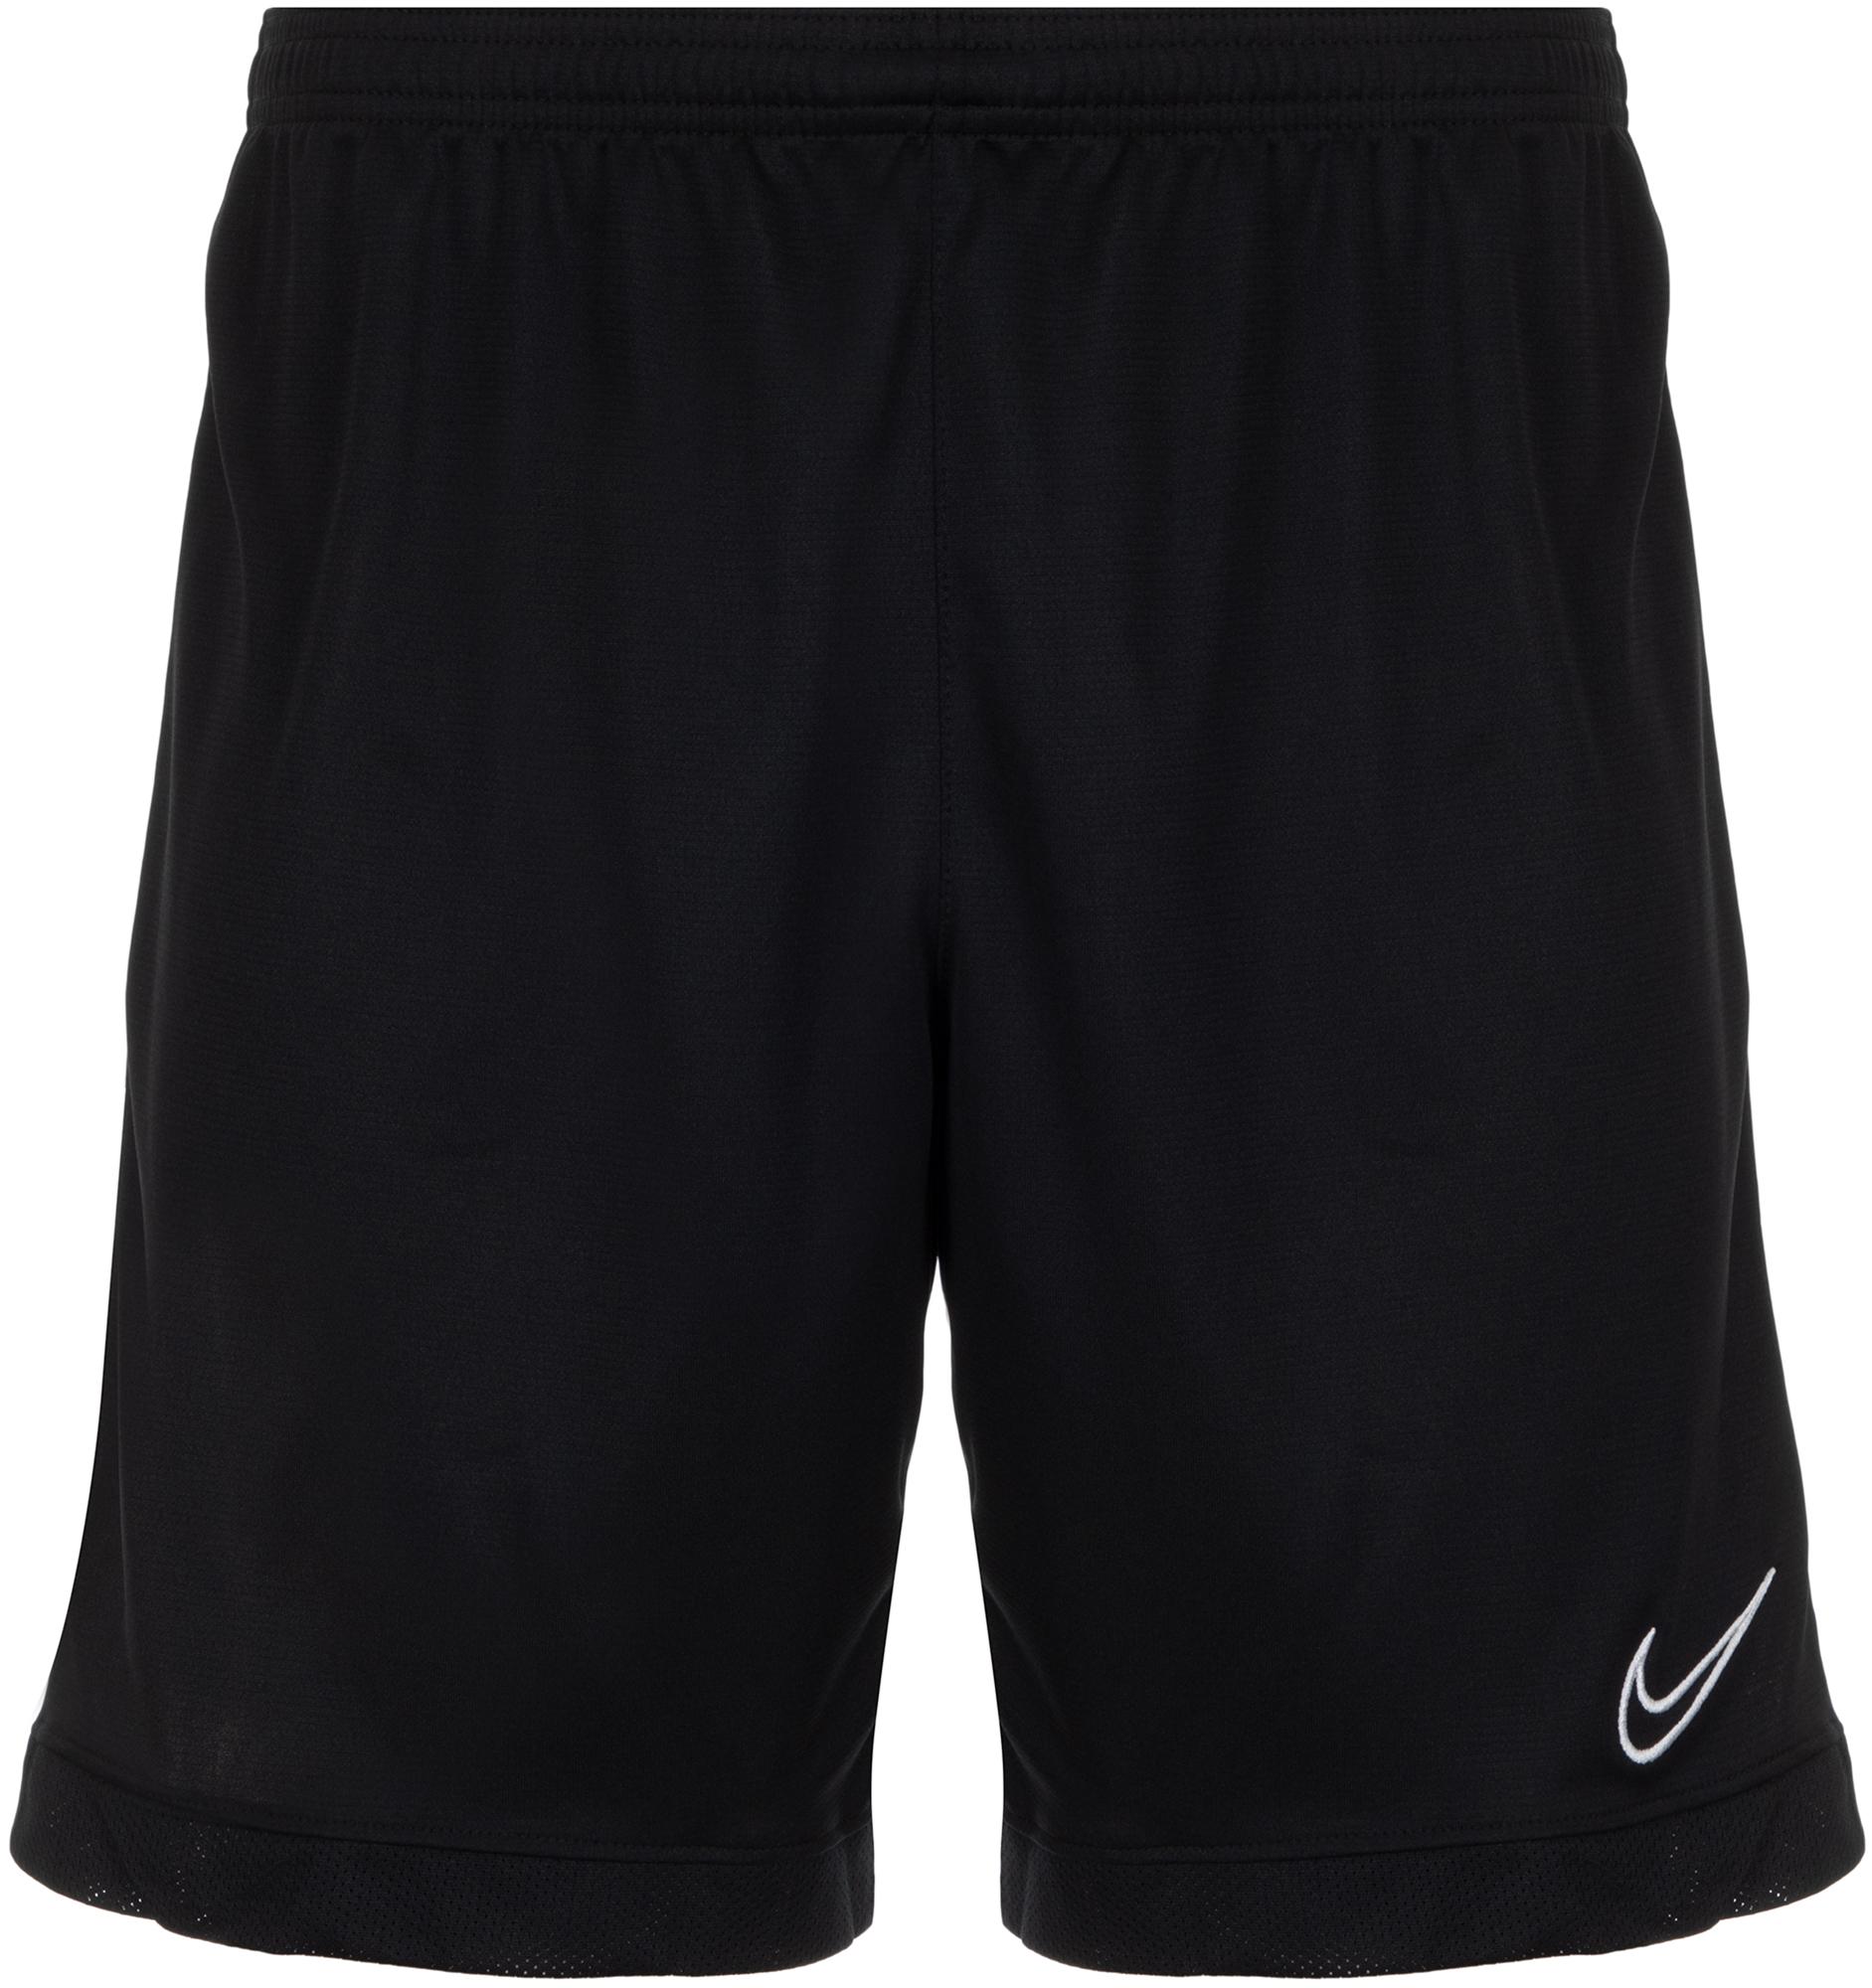 Nike Шорты мужские Dry Academy, размер 52-54